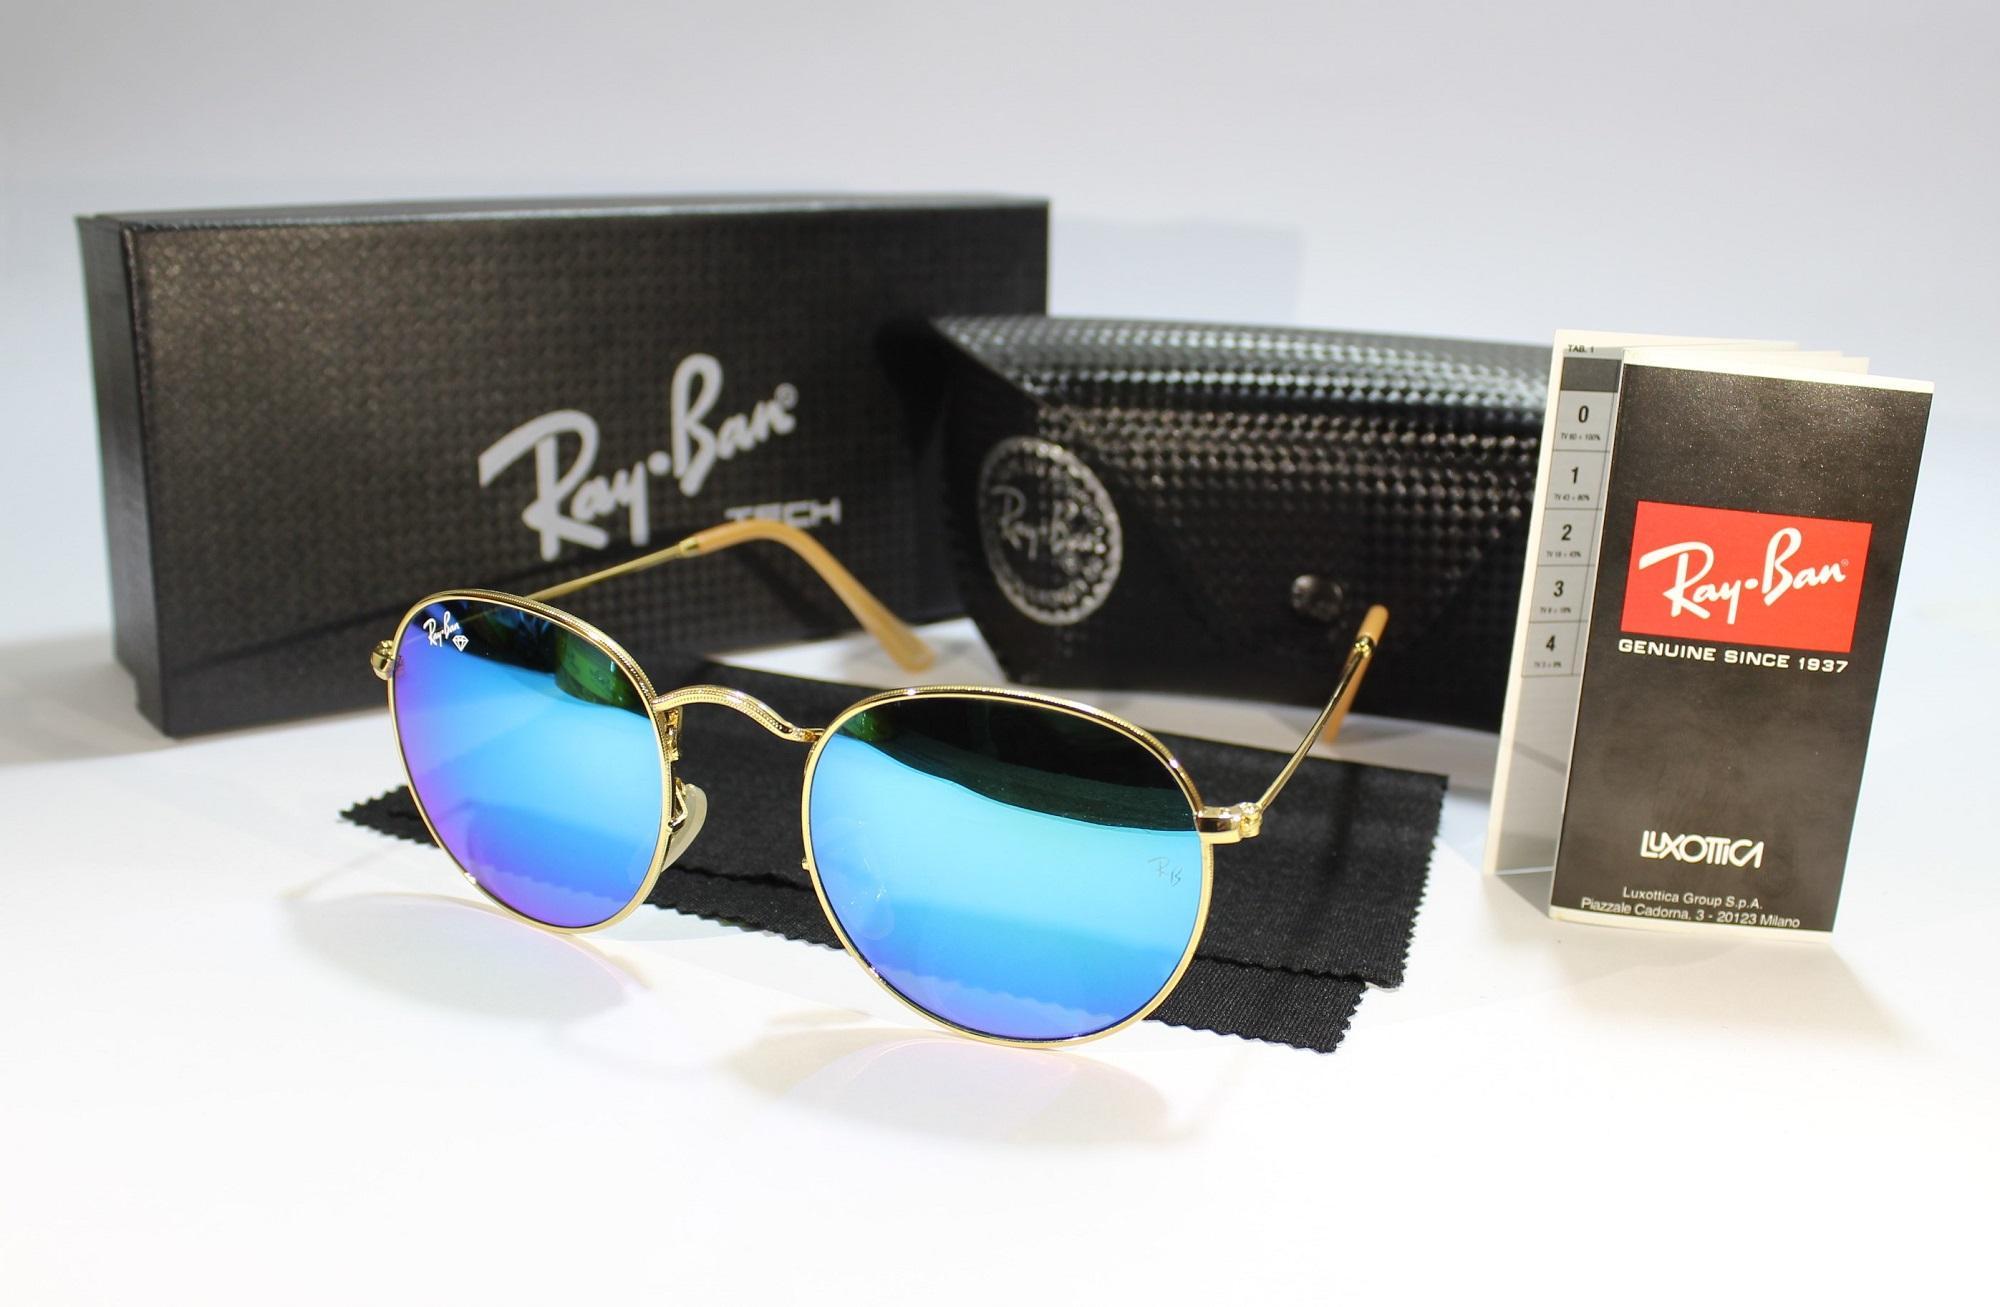 46e5a91e49 Womens Sunglasses  Buy Ladies Sunglasses Online in Pakistan - Daraz.pk